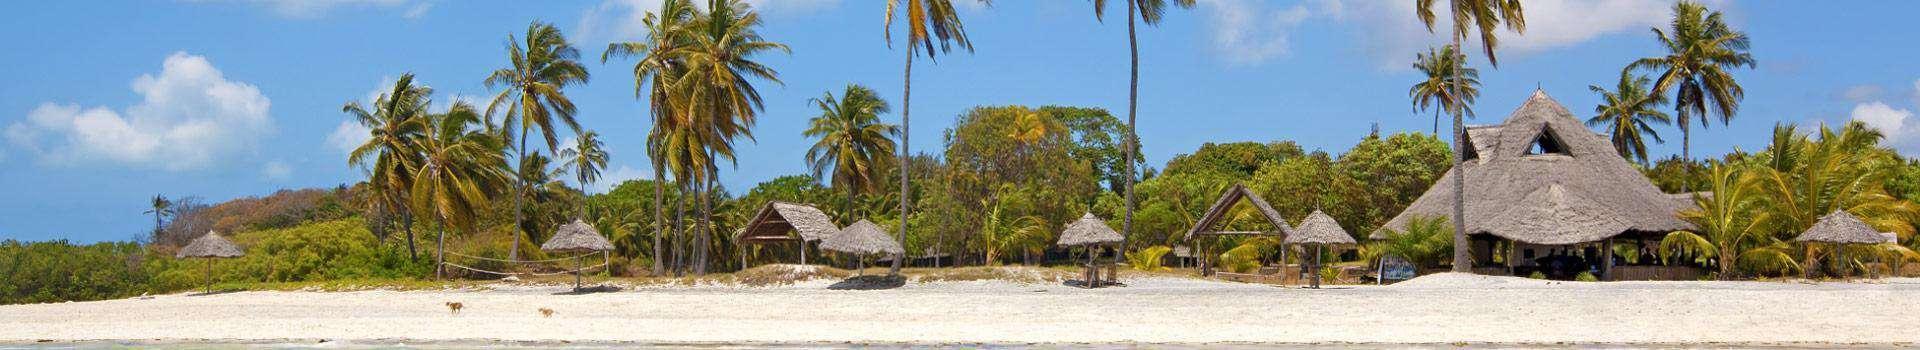 Travel to Zanzibar Holidays